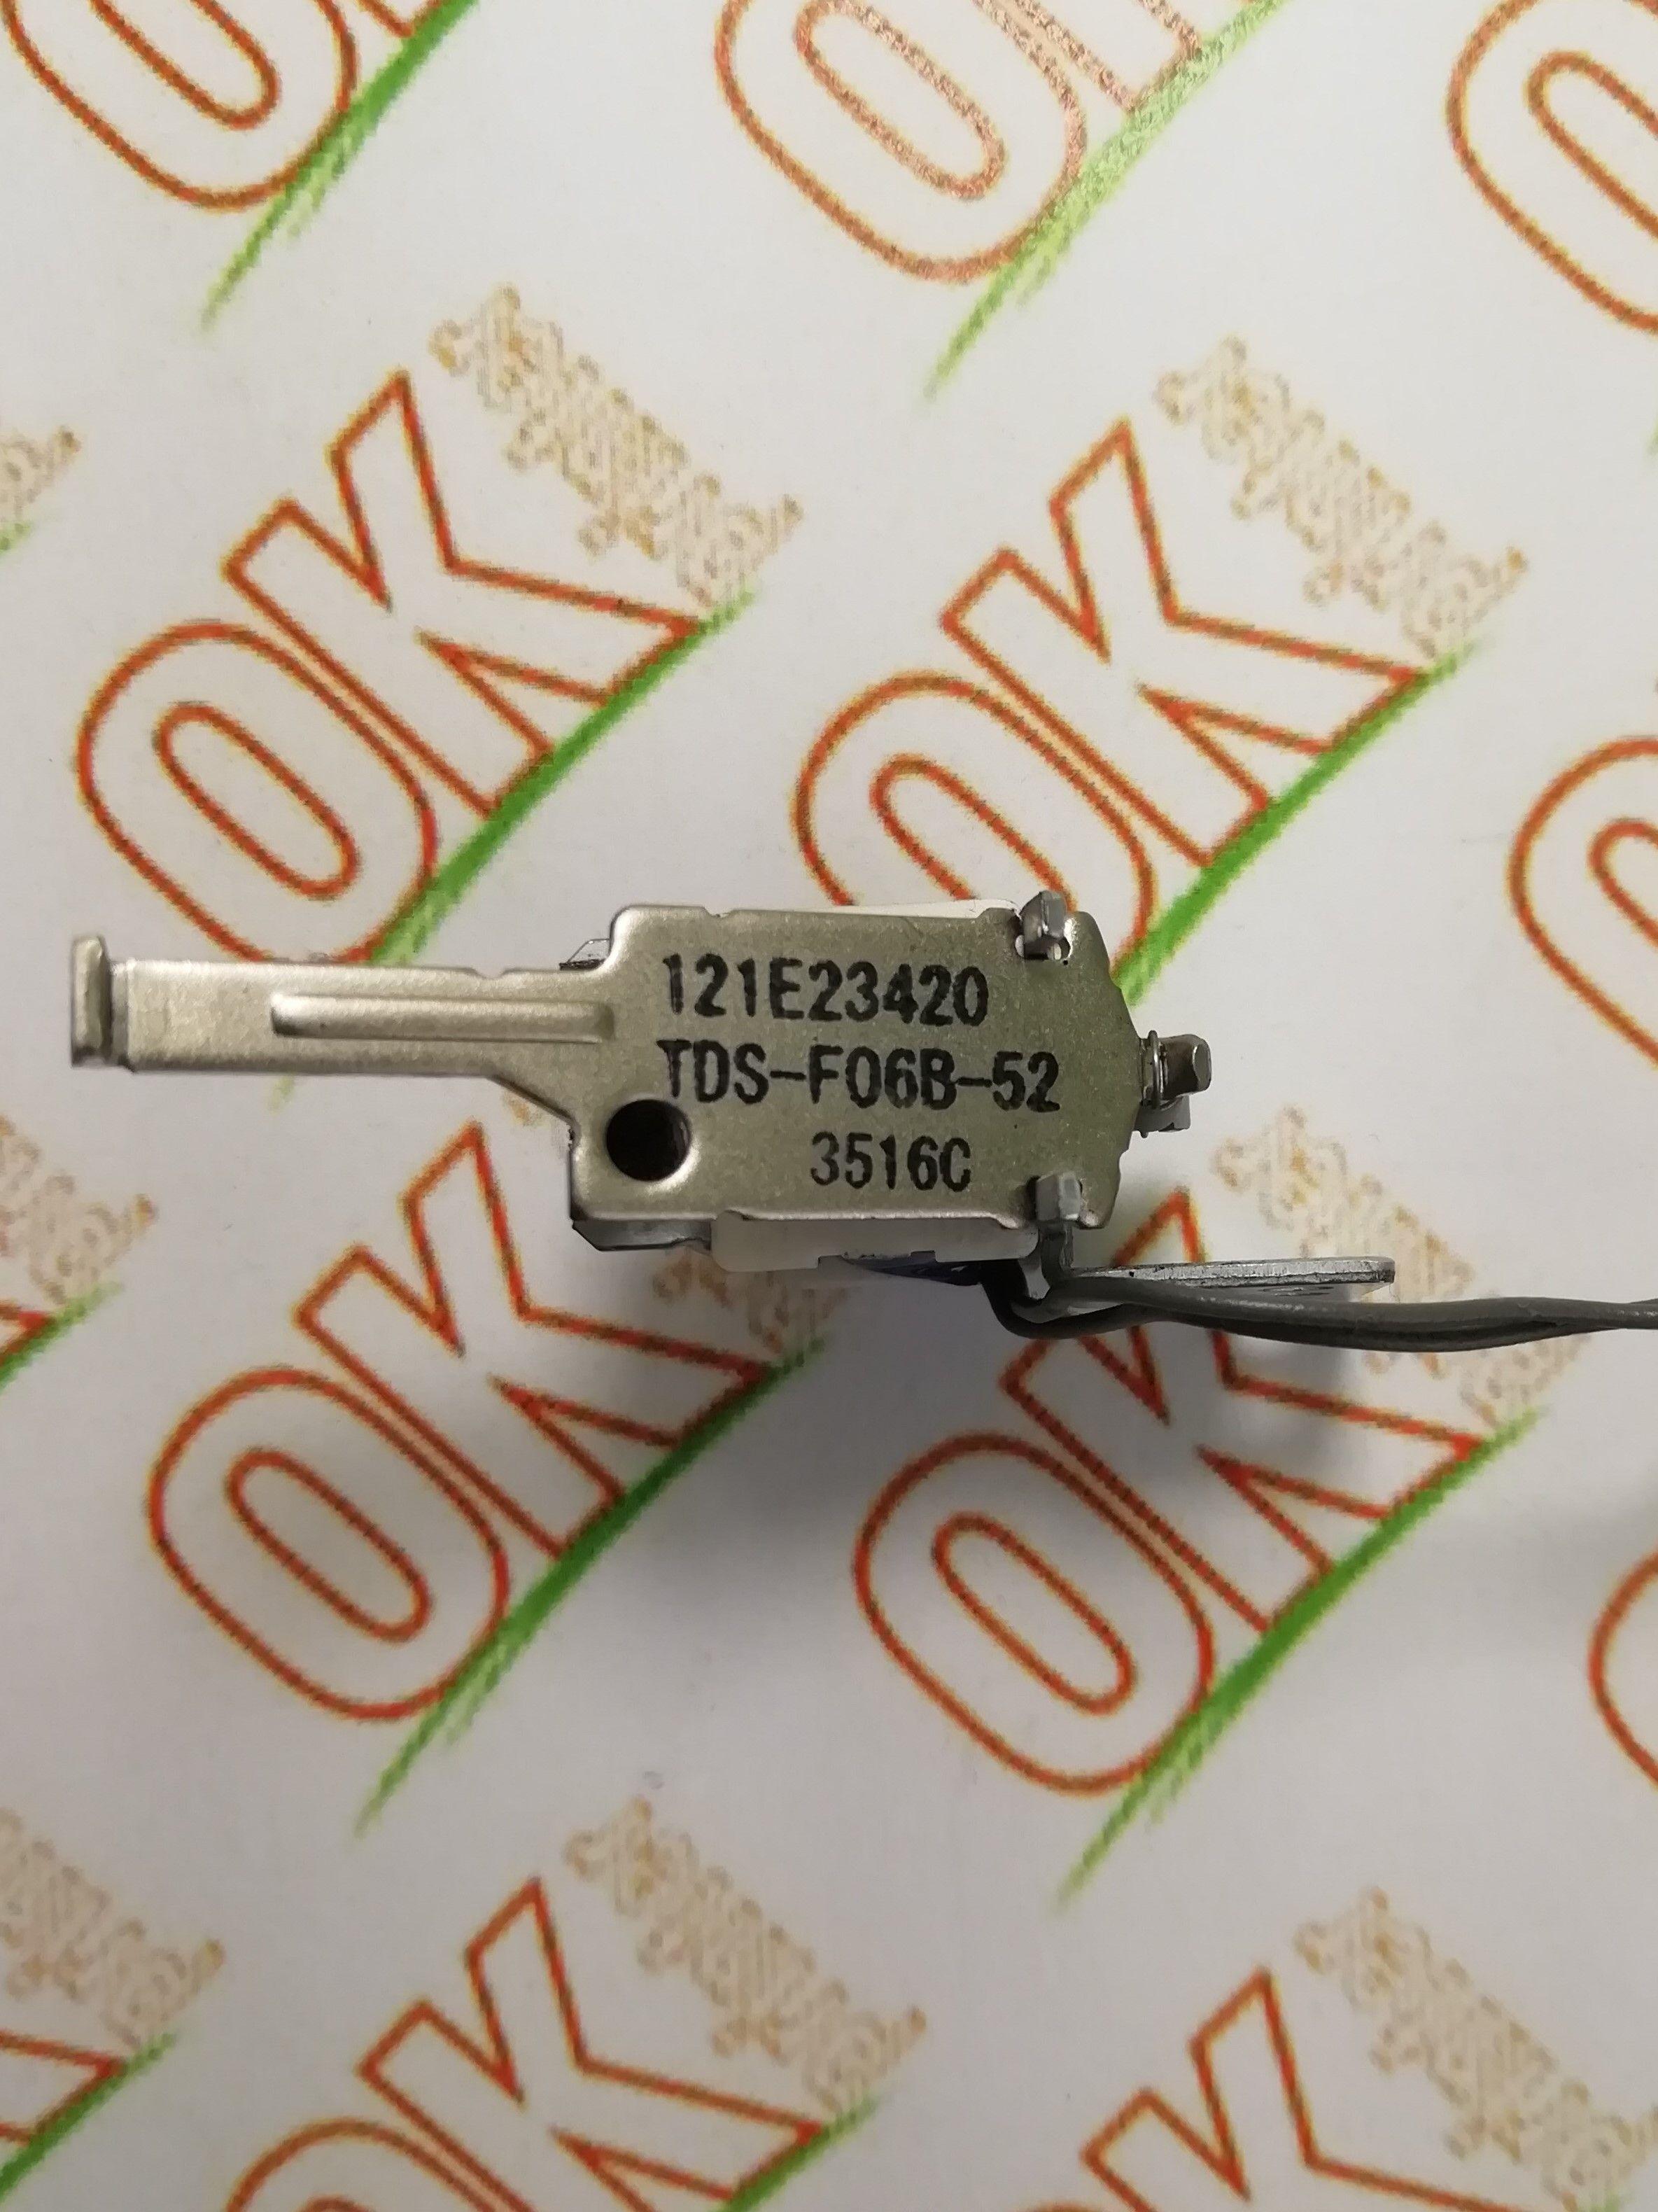 Фото товараСоленоїд XEROX PHASER 3010 TDS-F06B 52 | 121E23420